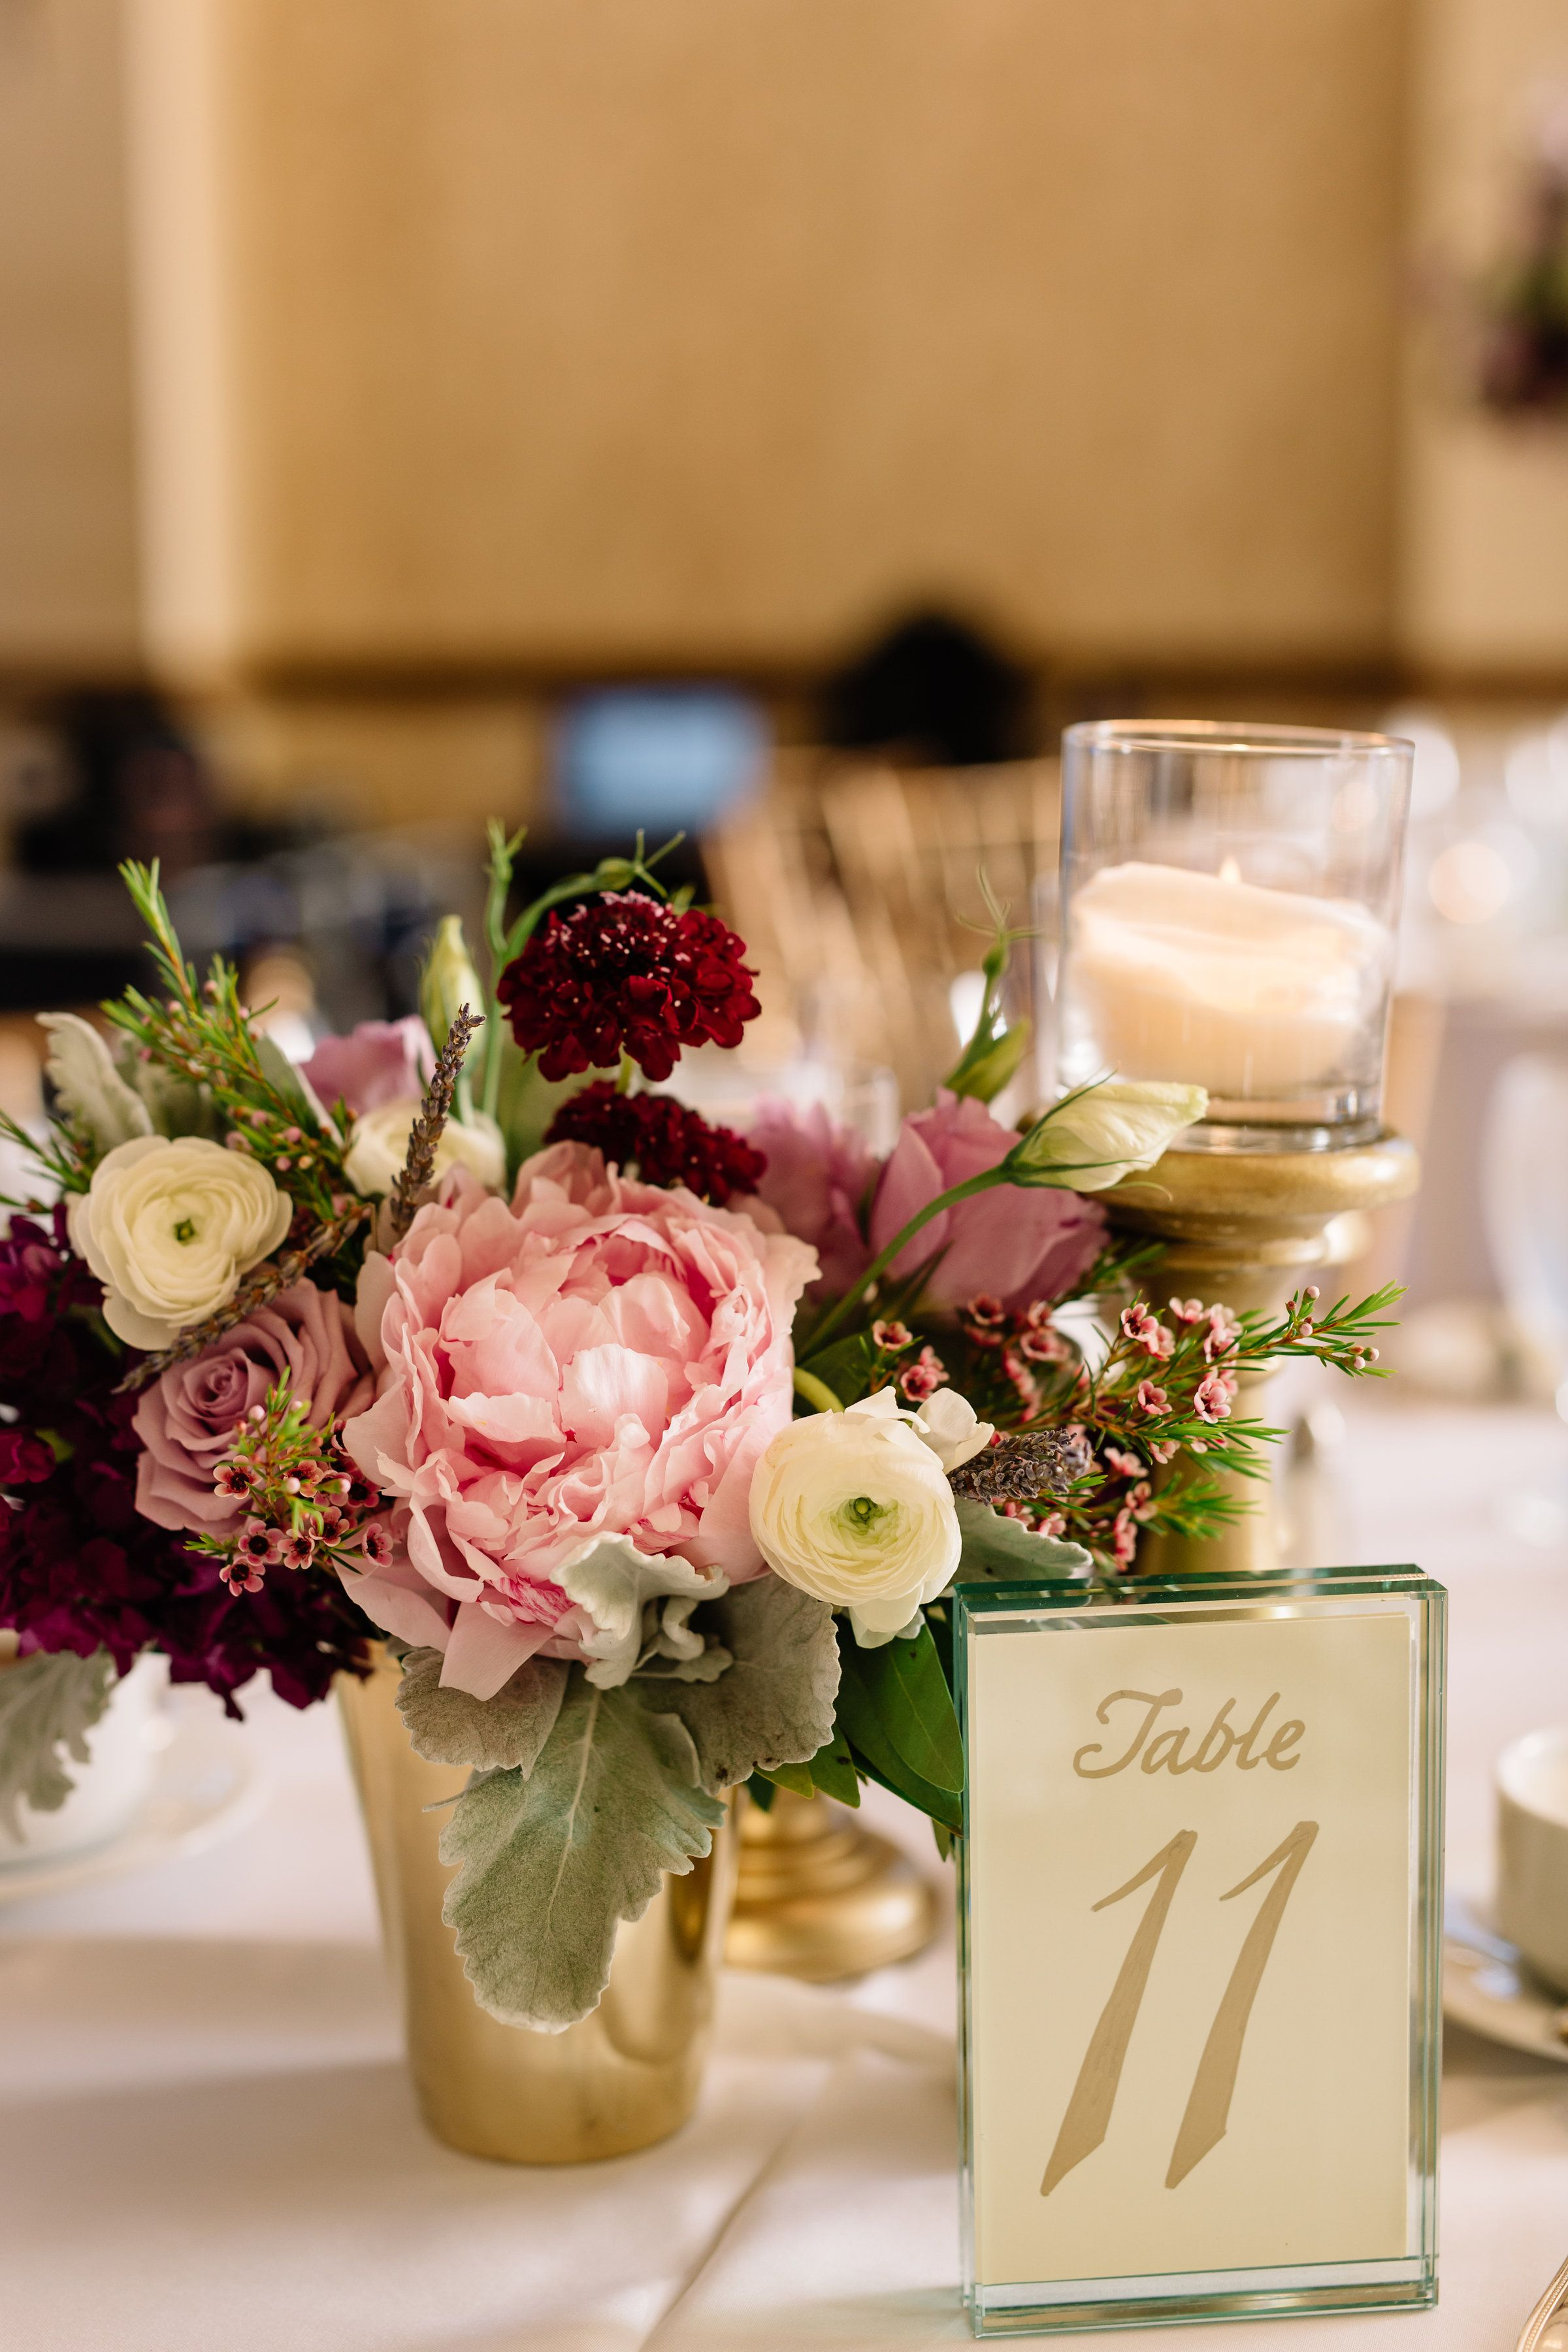 Bridesmaids Bouquets Of Pink Peonies Lavender Roses Burgundy Scabiosa Lavender Lisianthus